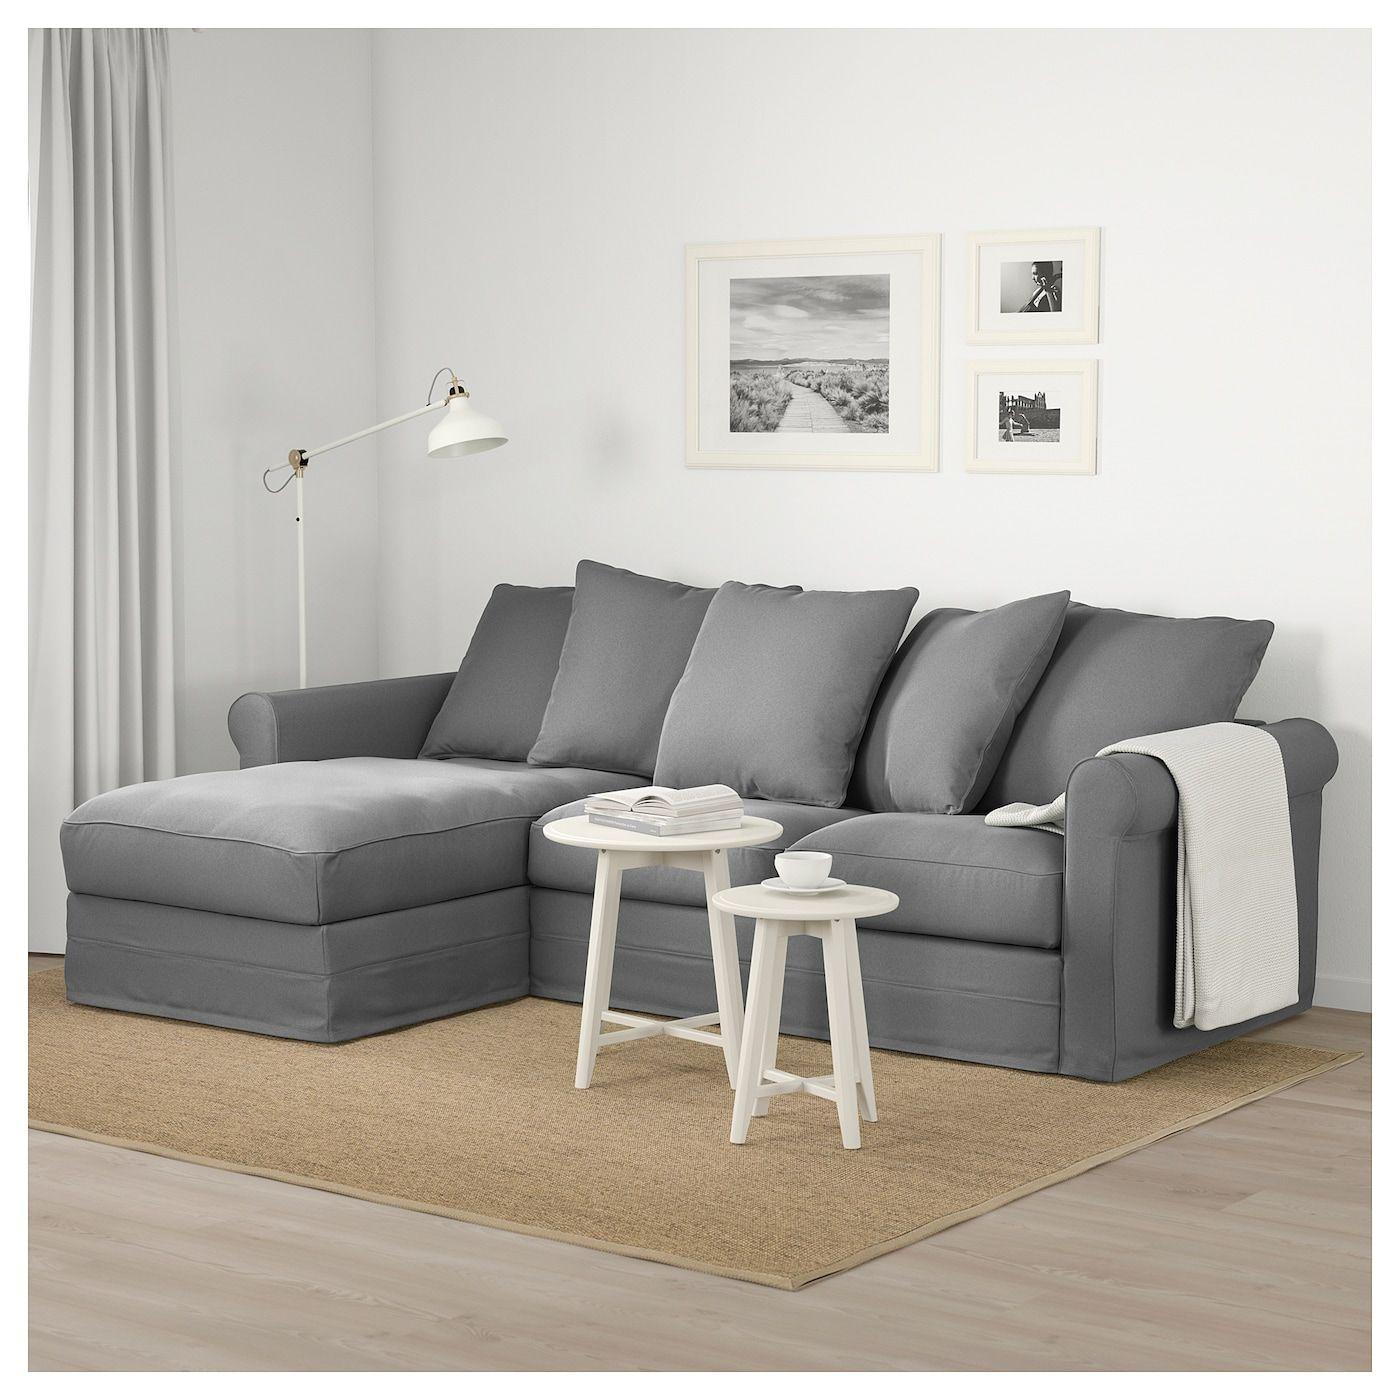 Ikea Gronlid Sofa Ikea Sofa Sofa Bed With Chaise Sofa